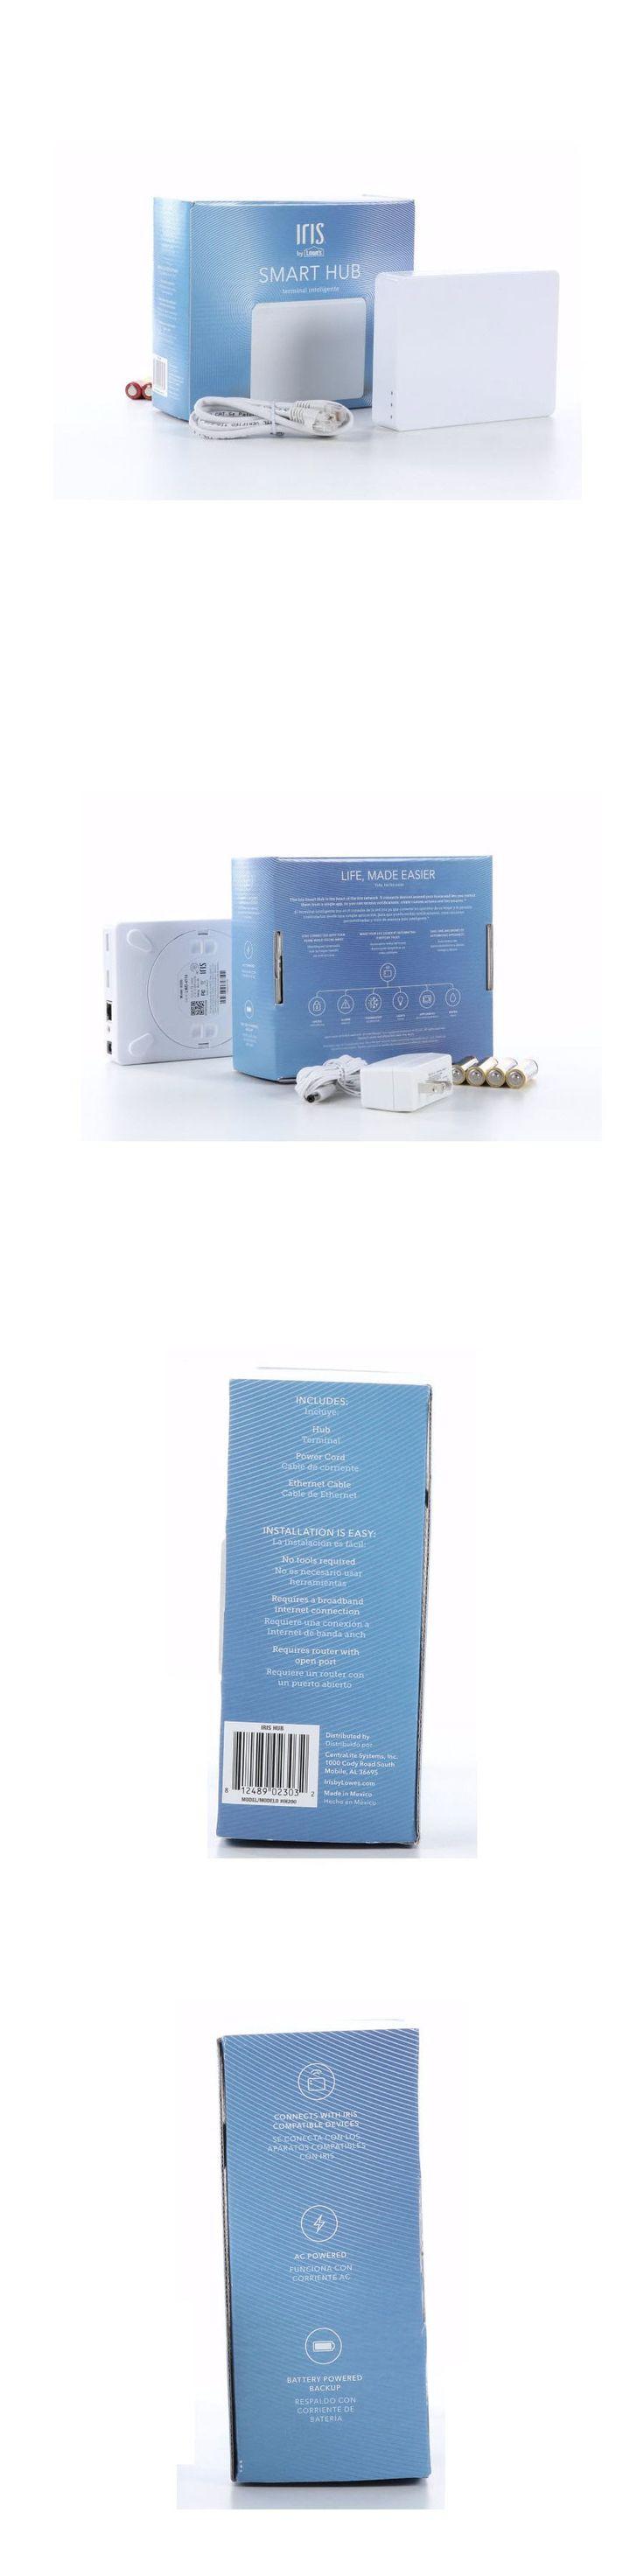 Home Automation Kits: New Lowes Iris 2nd Gen Smart Hub V2 9402l Smart